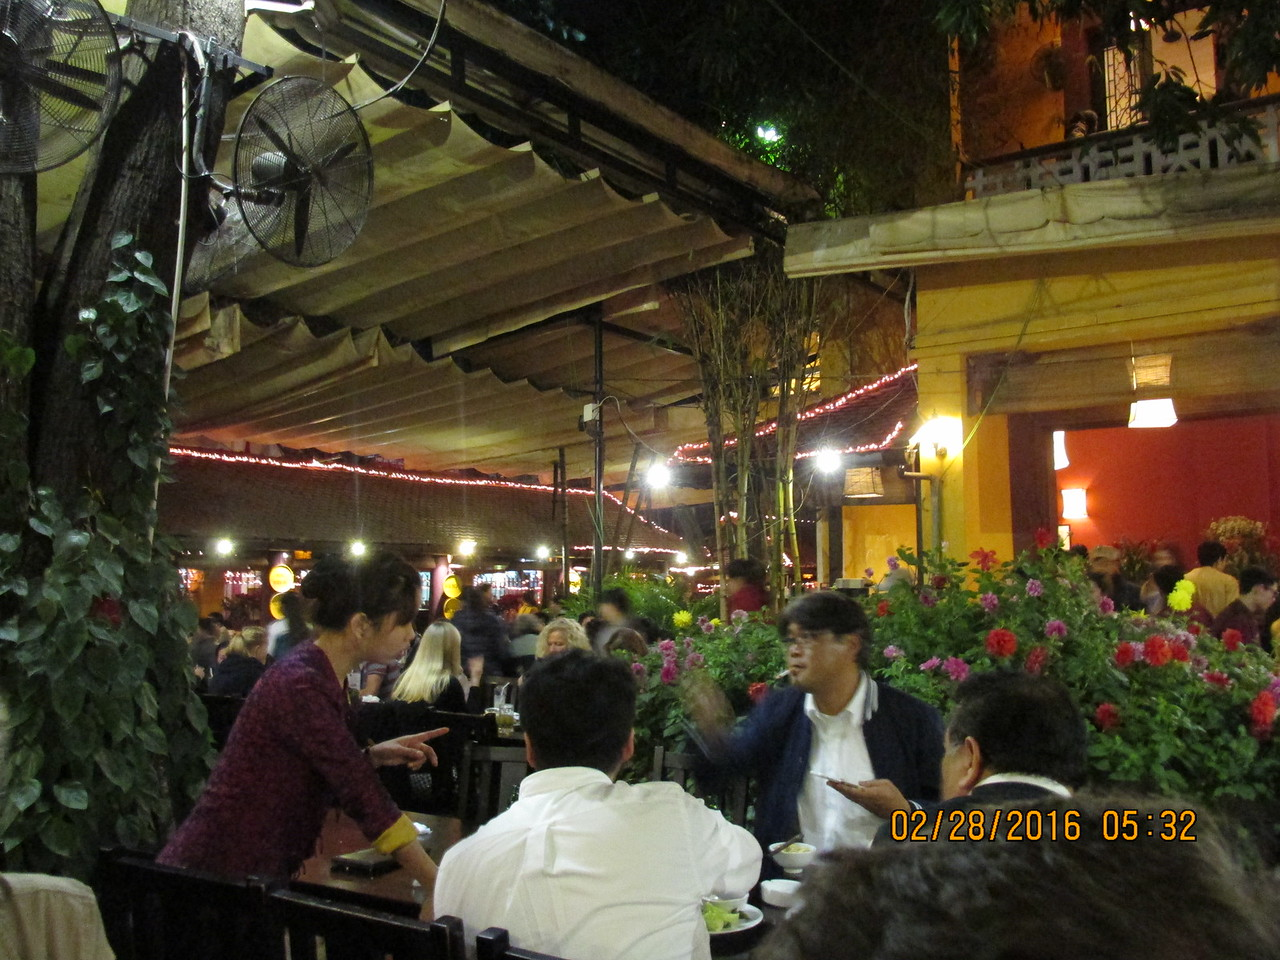 0067 - Quan An Ngon Restaurant on Phan Boi Chau - Hanoi Vietnam - Date Correct but Time on Pic is Wrong